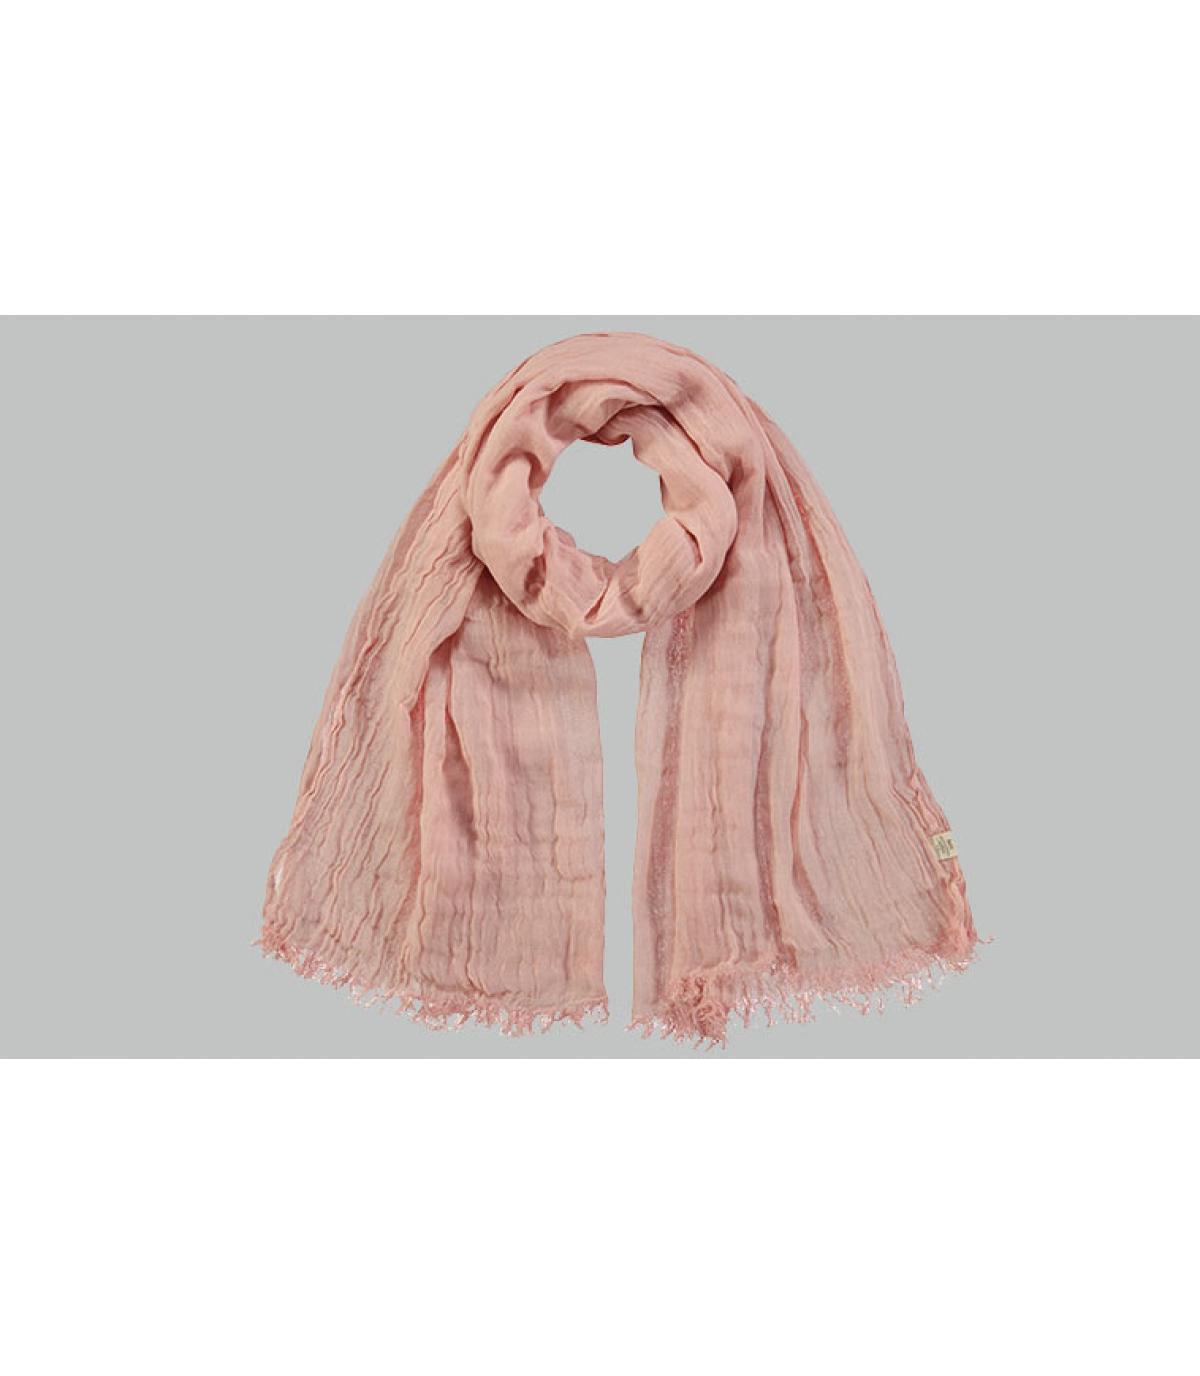 roze katoenen sjaal